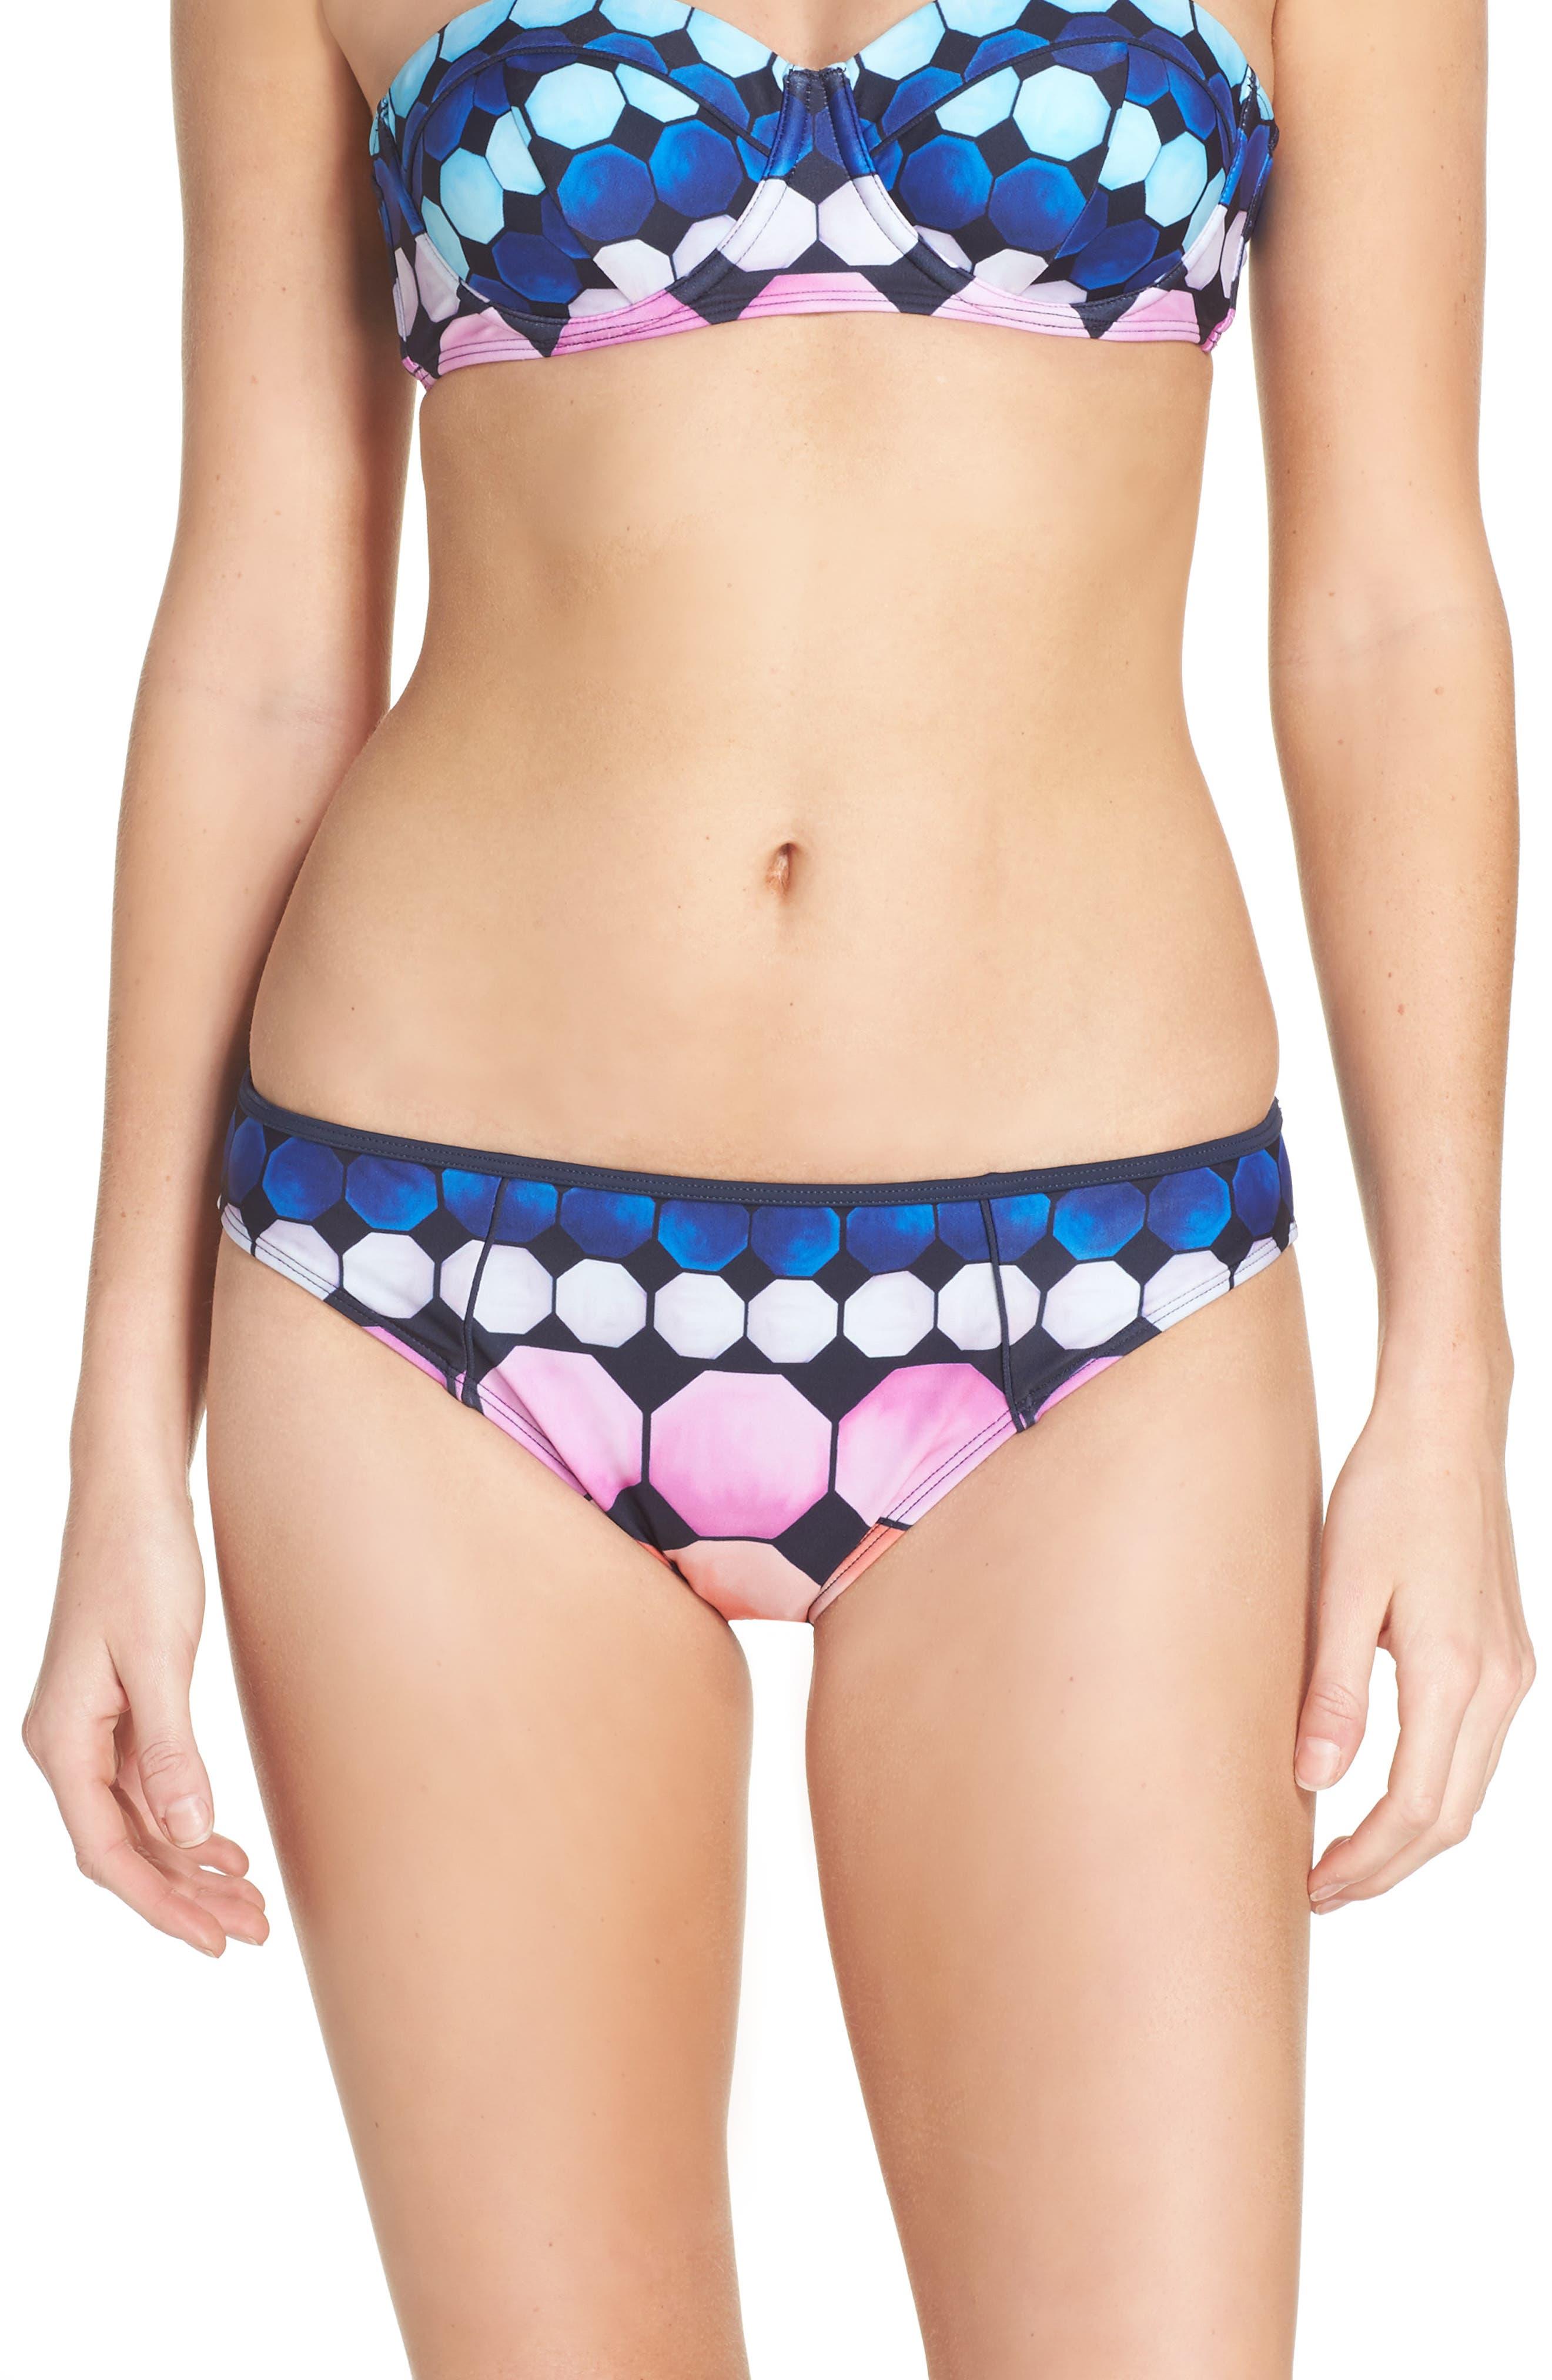 Marina Mosaic Bikini Bottoms,                             Main thumbnail 1, color,                             410